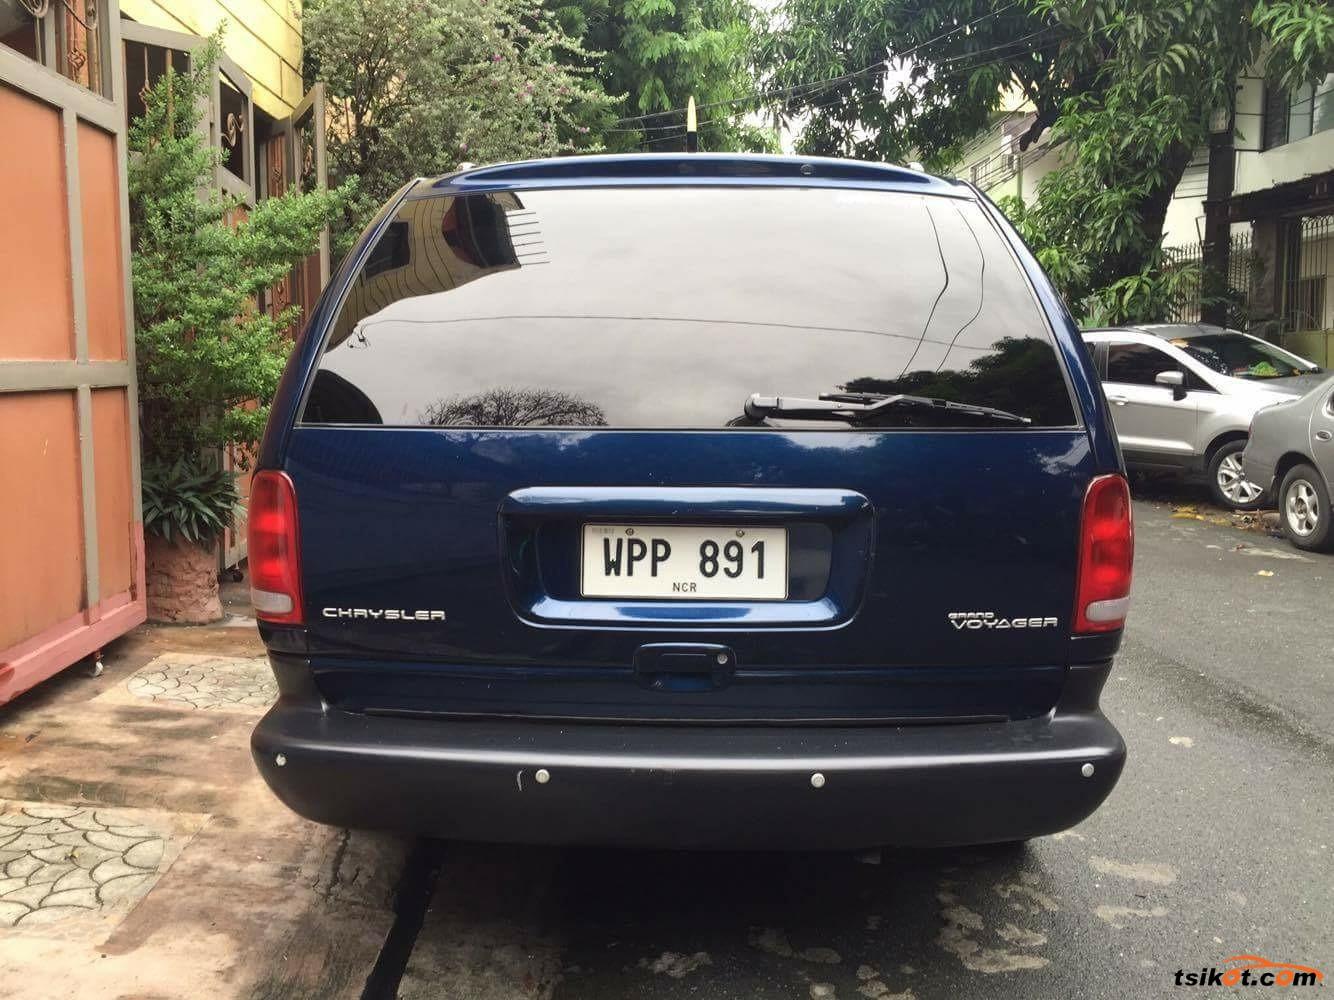 Chrysler Voyager 2000 - 5